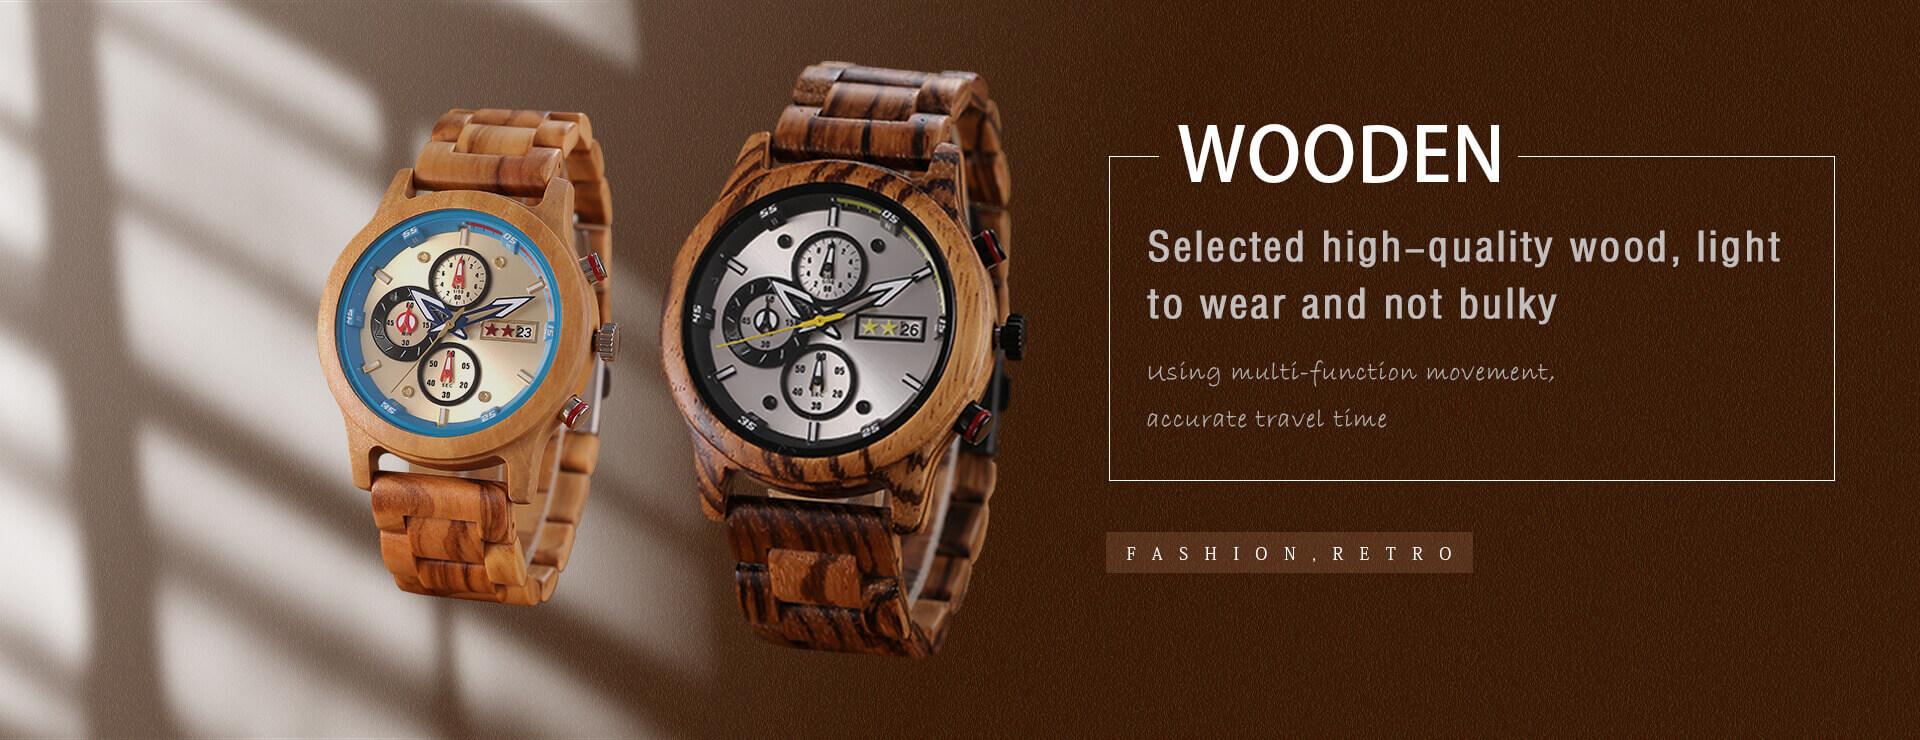 Full Wooden Watch